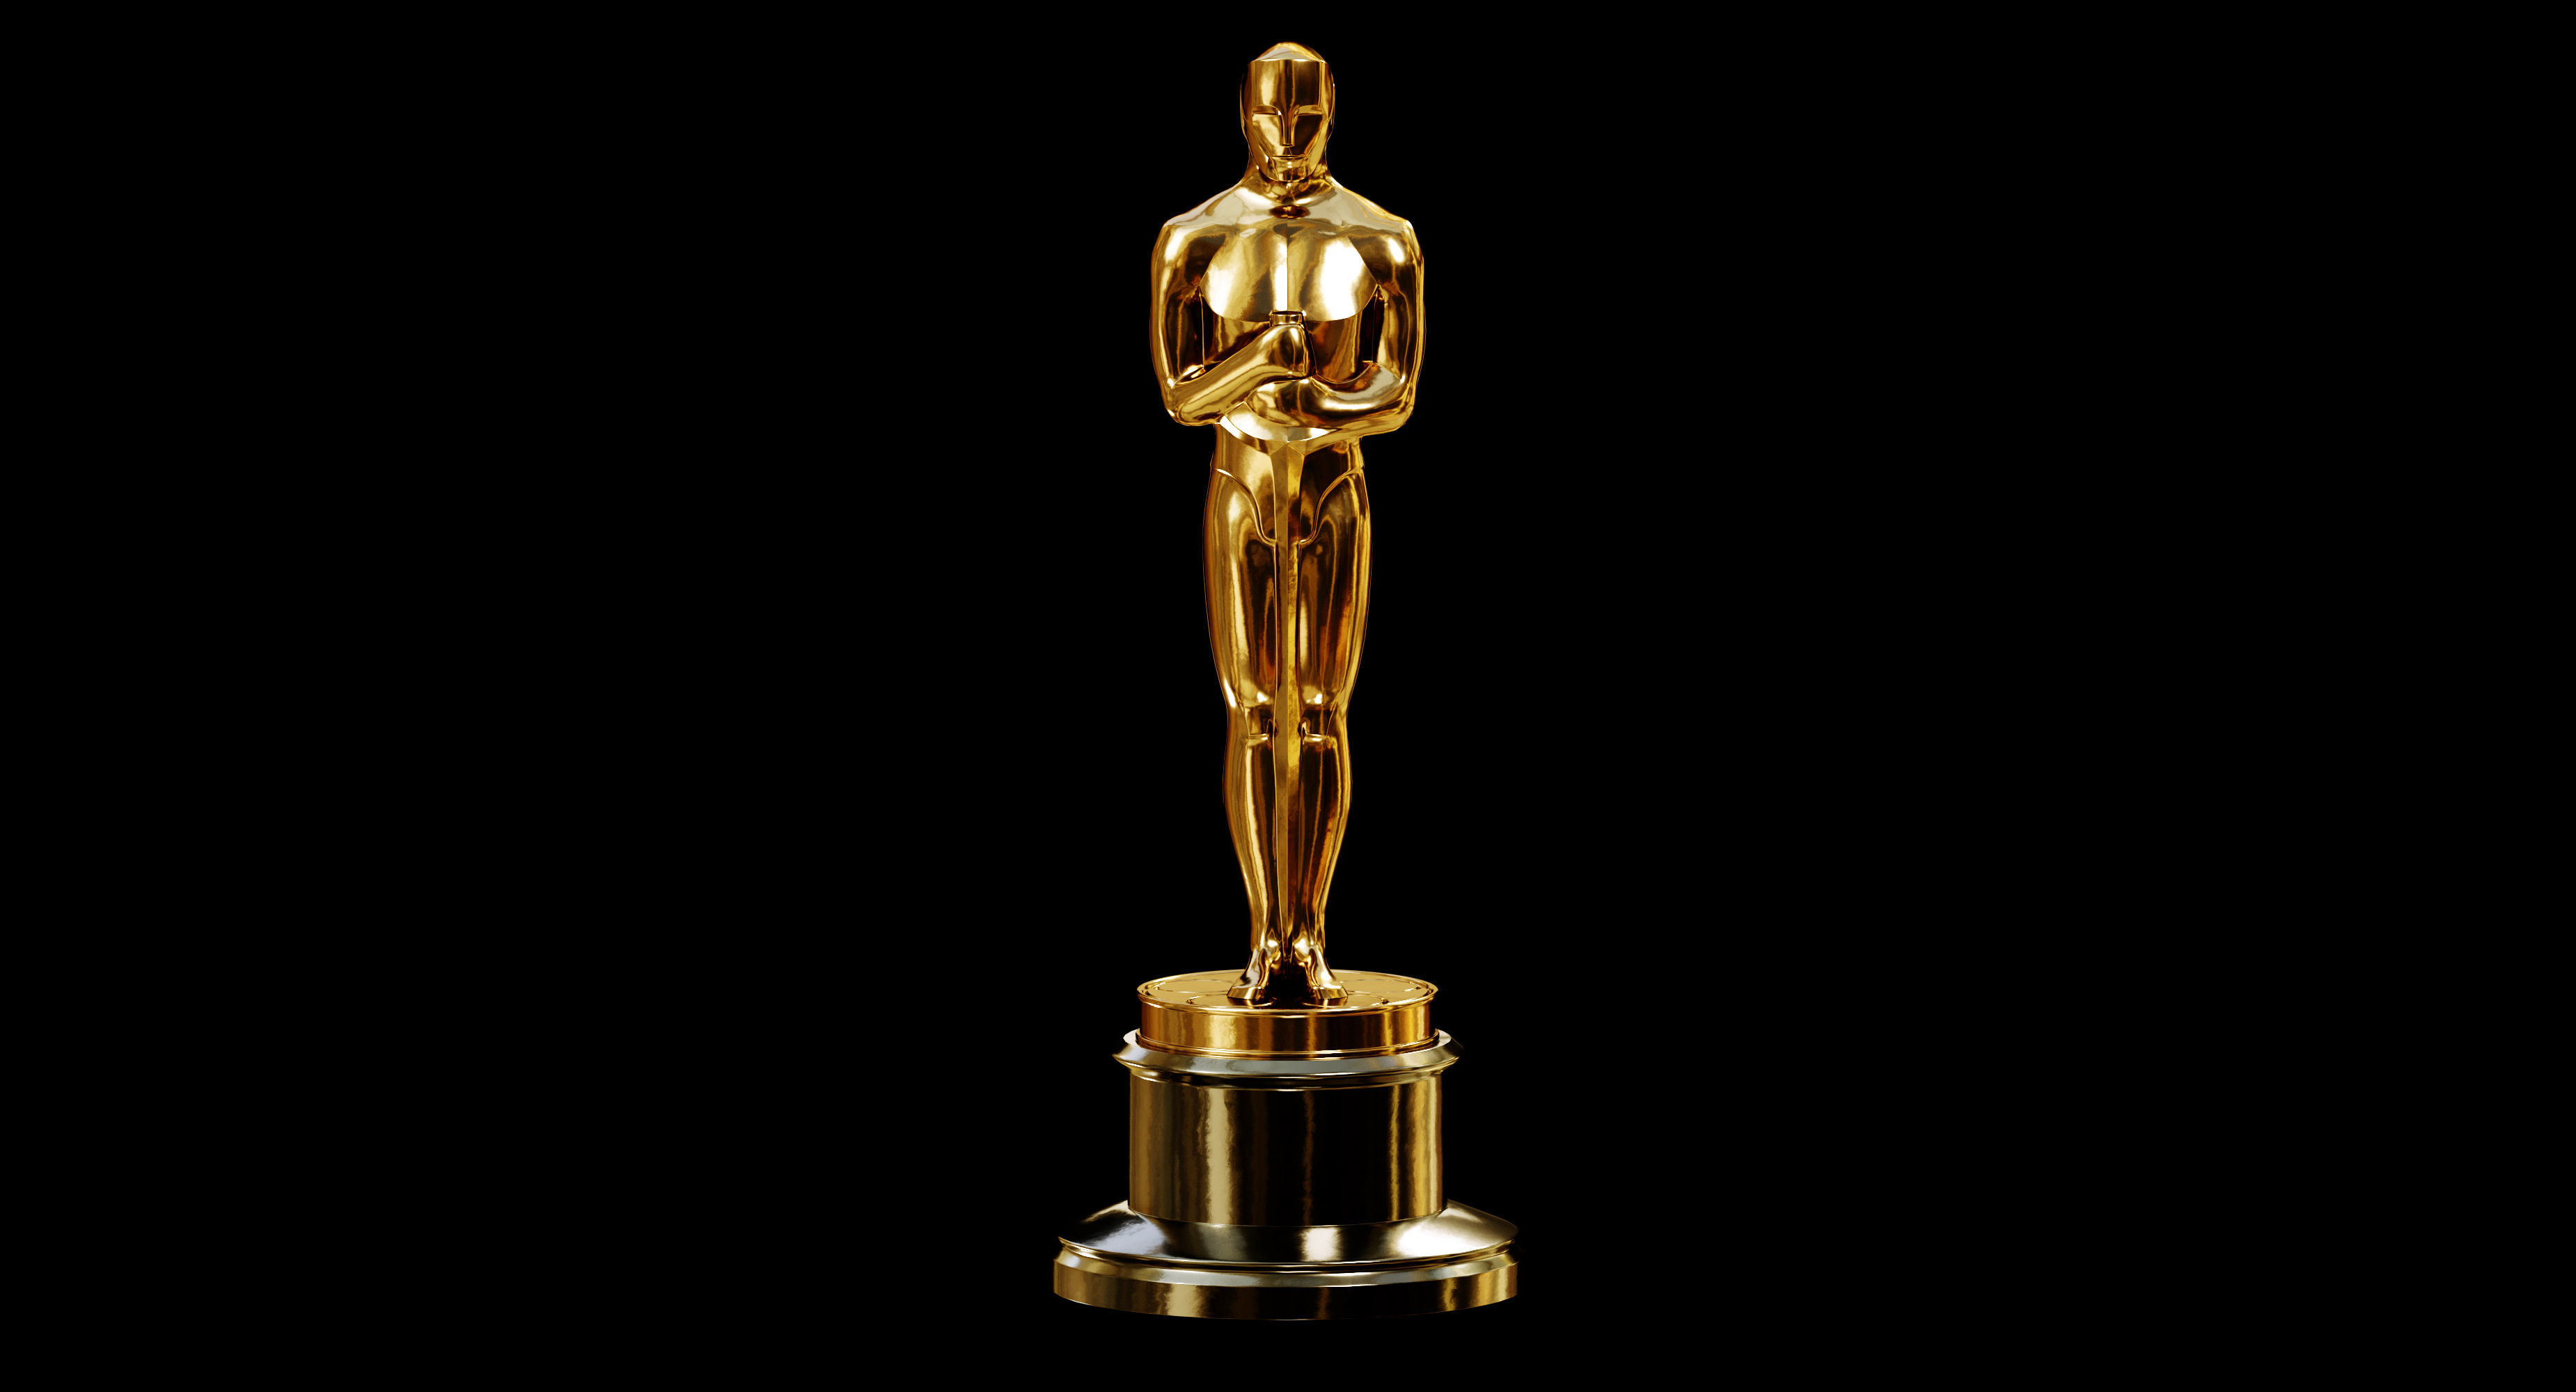 indian-oscar-award-winners-ऑस्कर अवार्ड